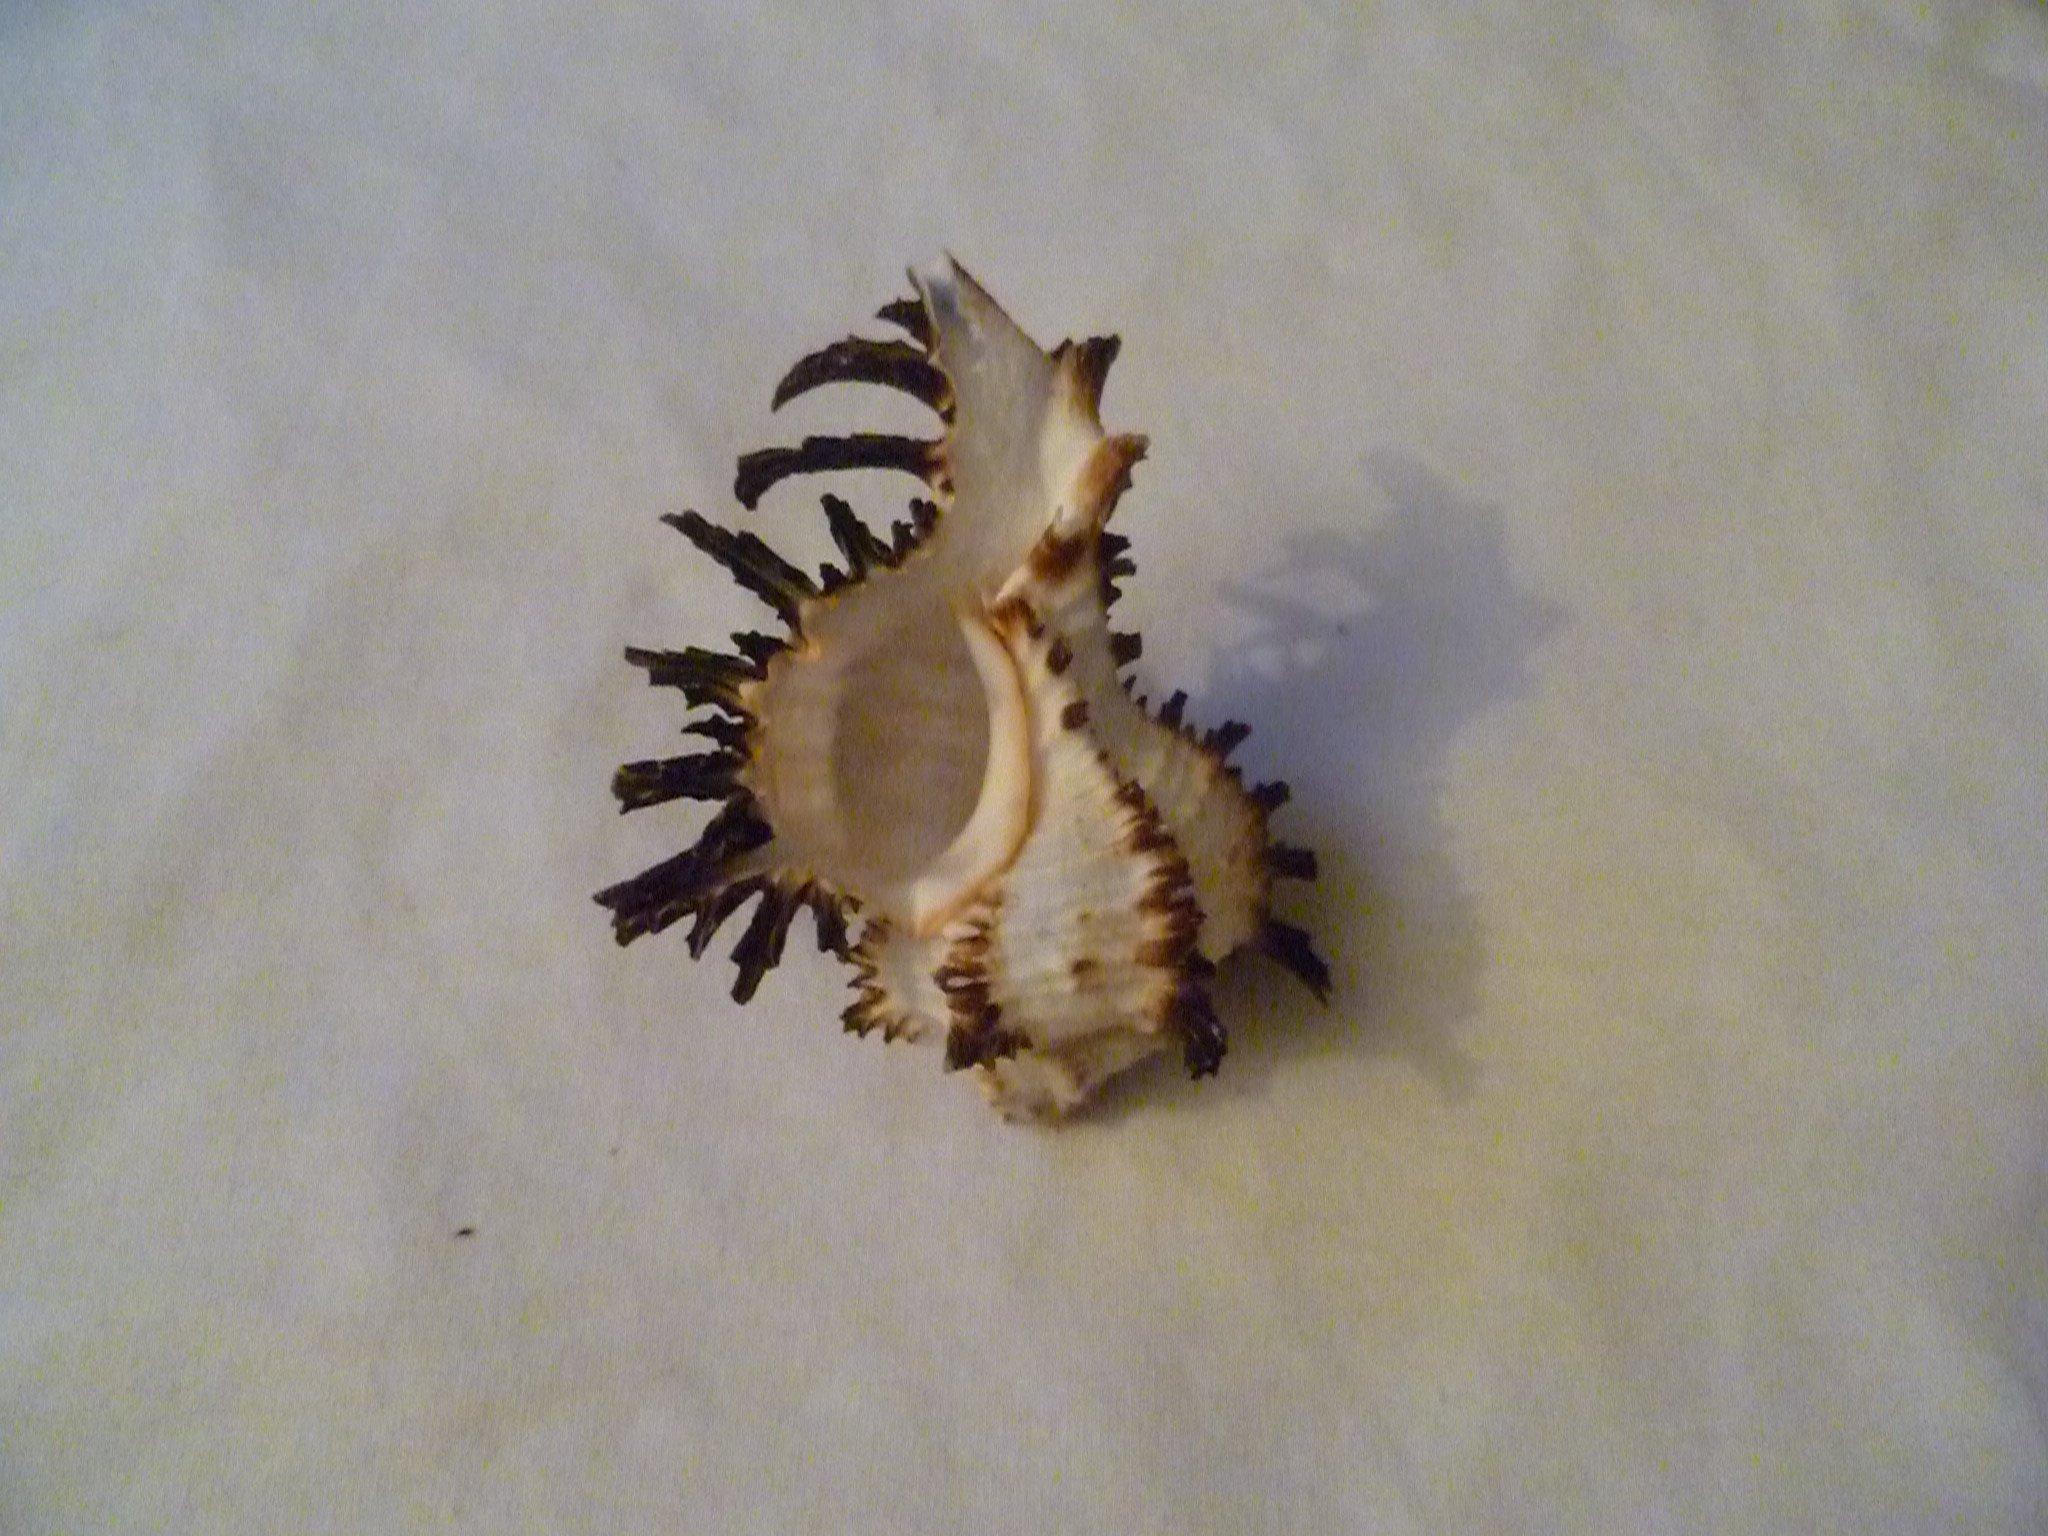 Spiney Murex Seashell